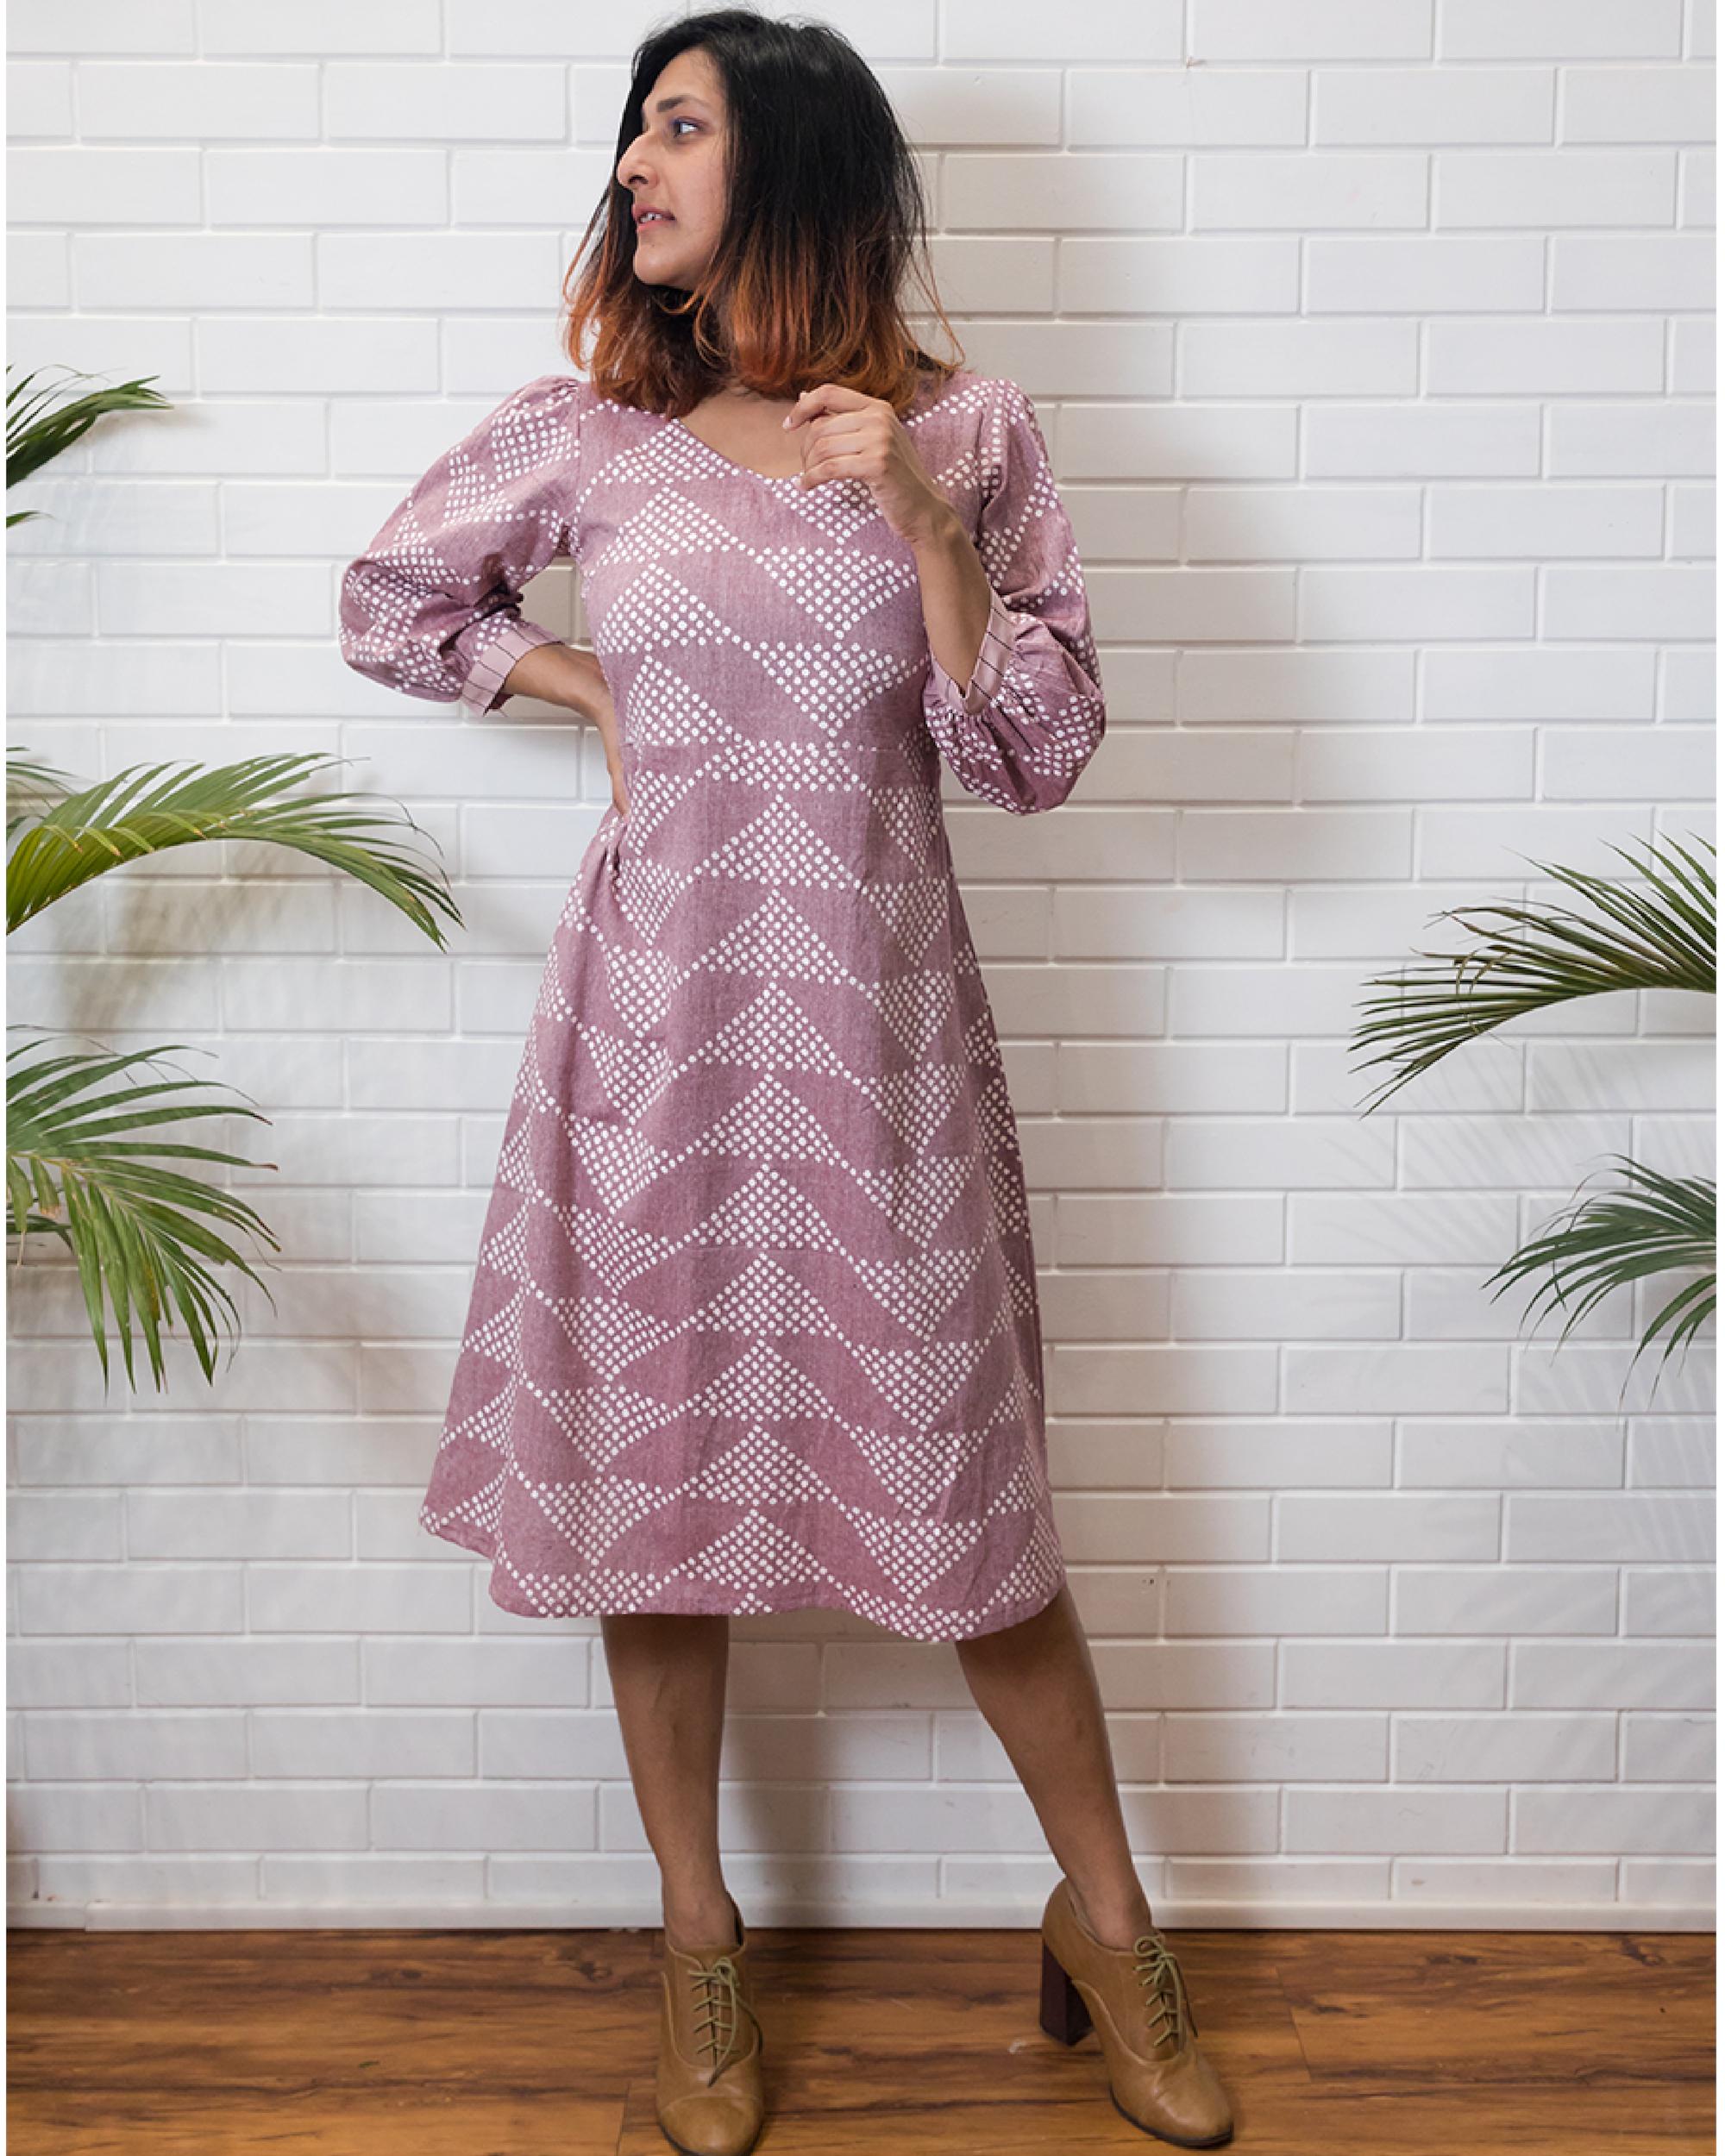 Lavender puff sleeves dress